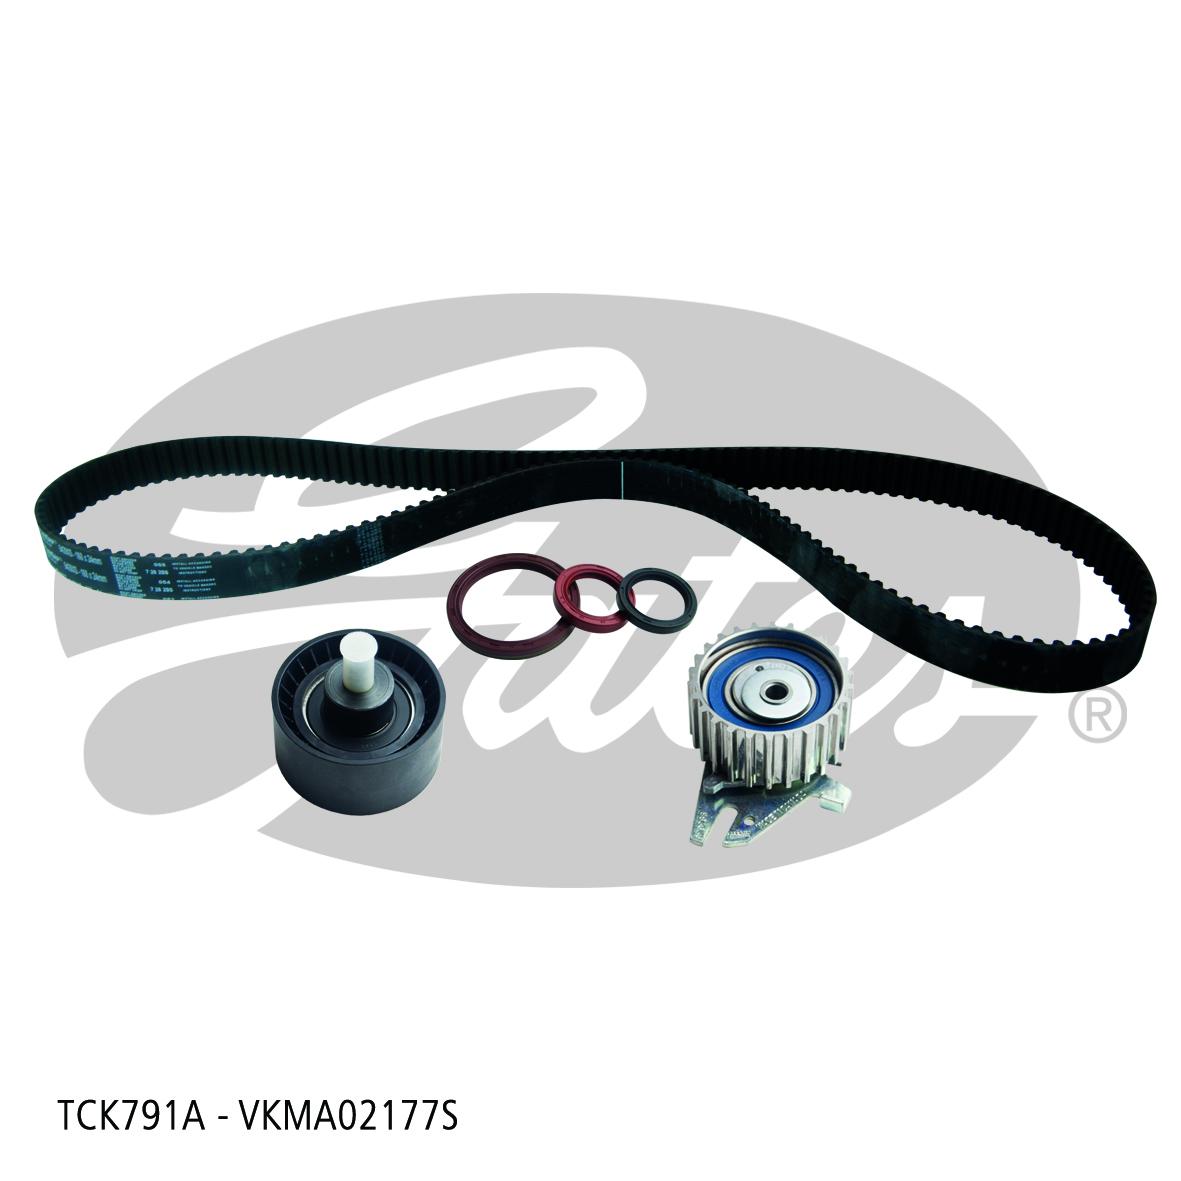 New Gates Timing Belt Kit TCK791A fits Alfa Romeo 147 2.0 16V Twin Spark